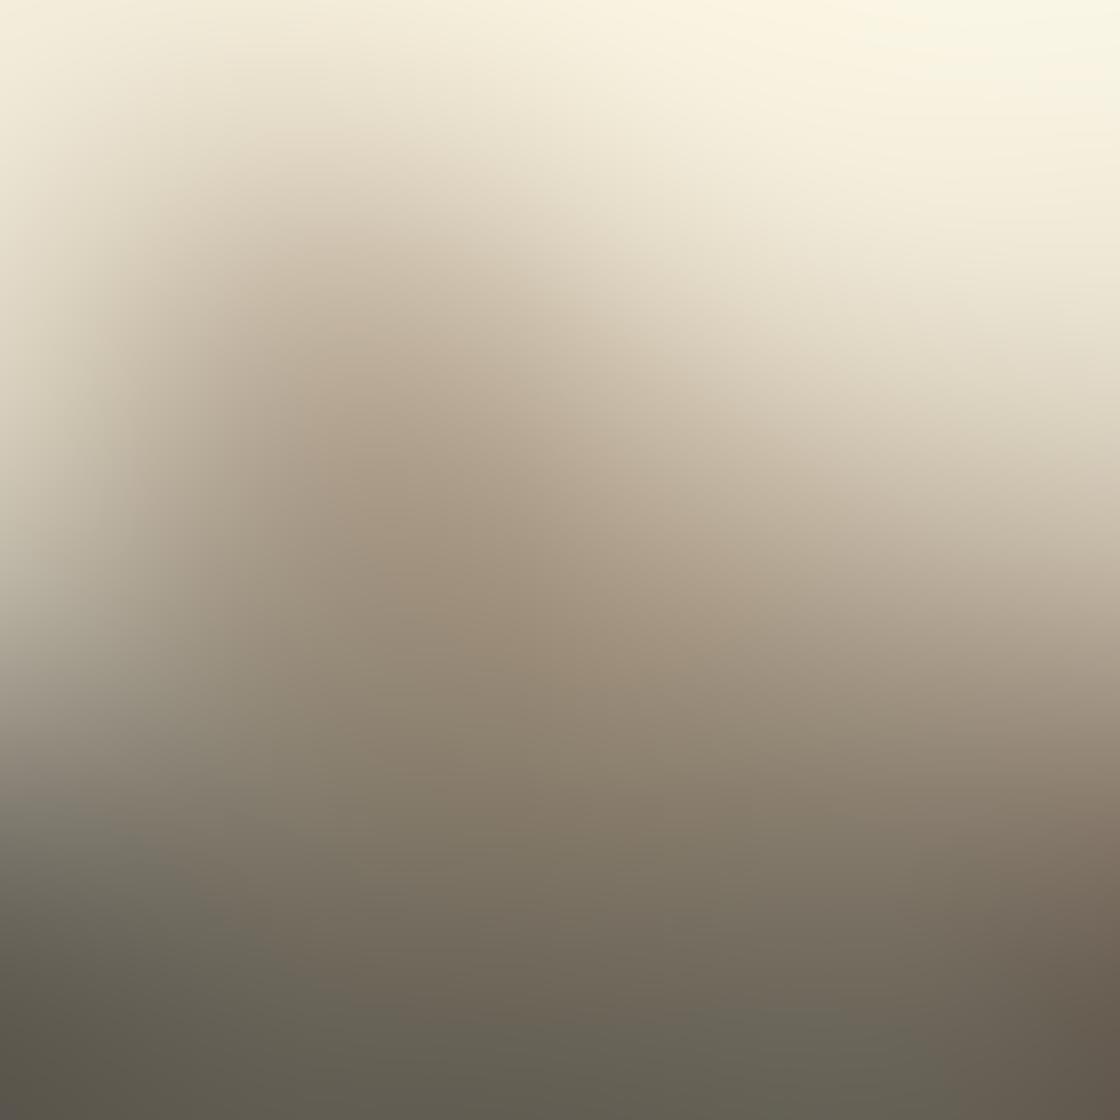 iPhone Photo Perspective 13